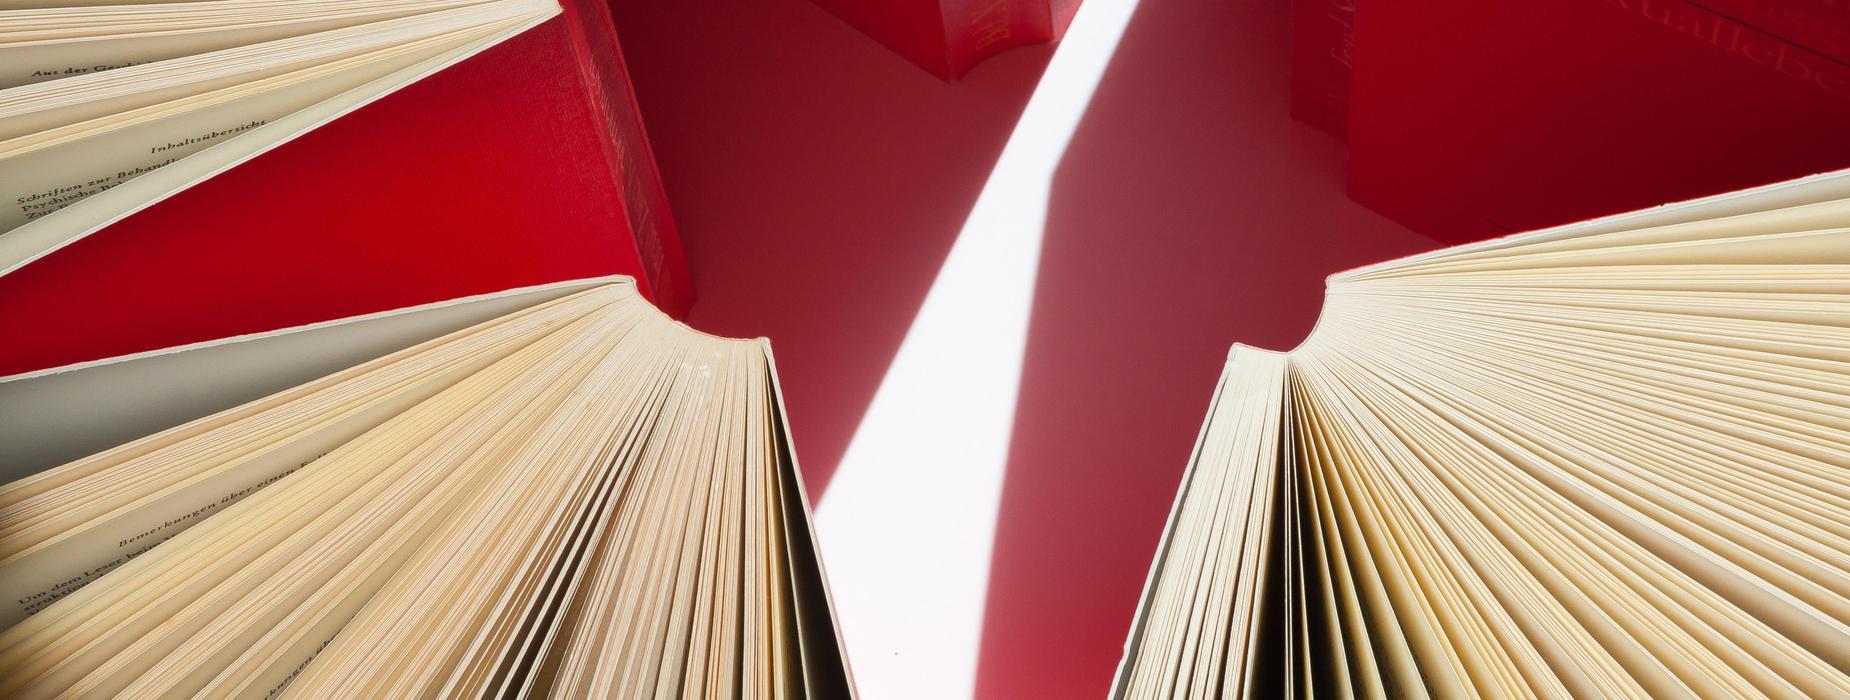 Red bound books